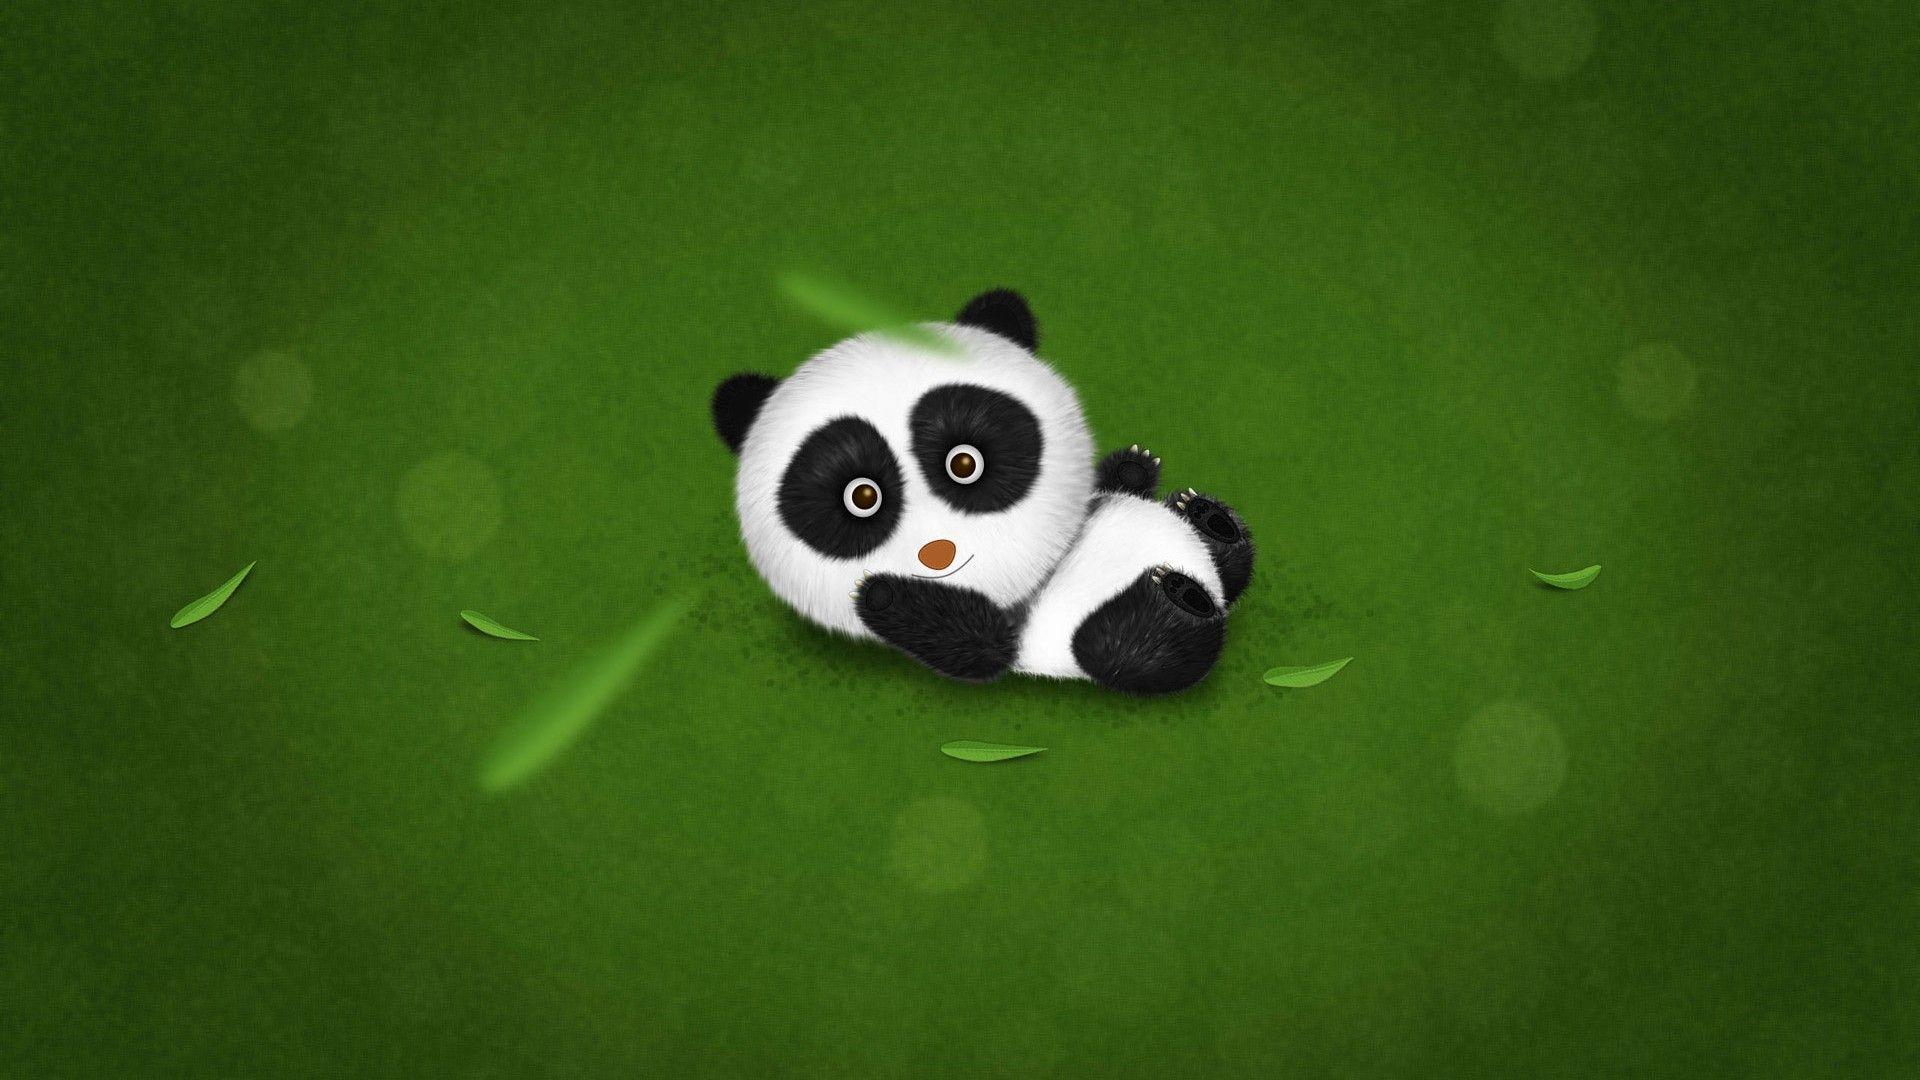 1600x900 Cute Panda Wallpaper Awesome Cutepanda Hd Mobile Desktop